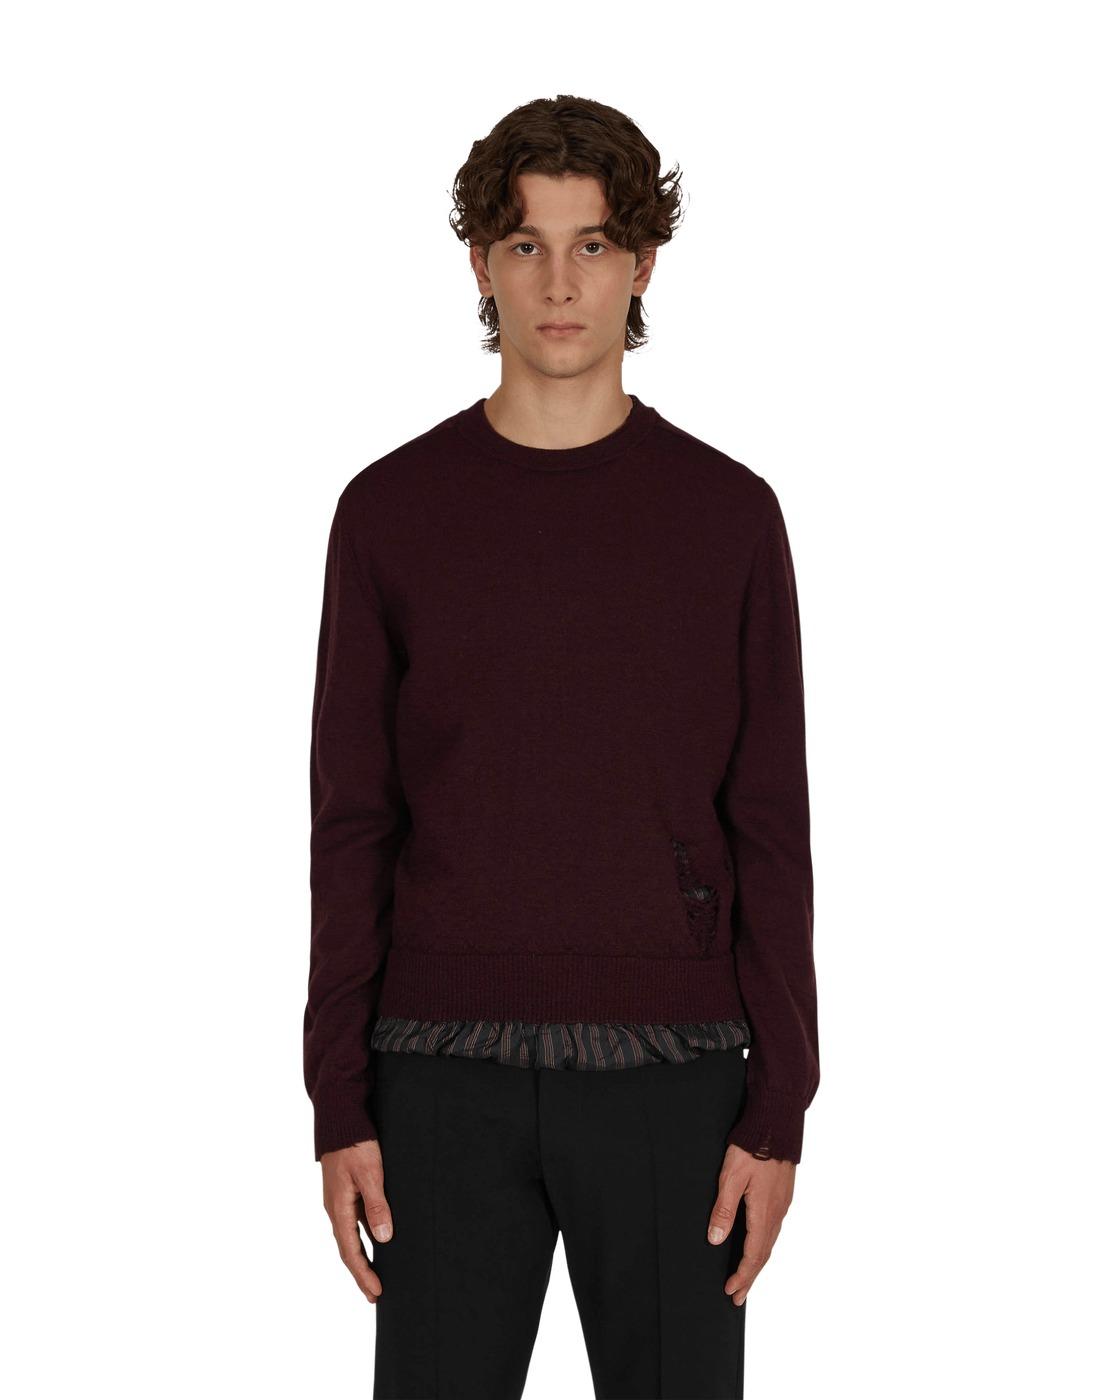 Photo: Maison Margiela Anonymity Of The Lining Sweater Black